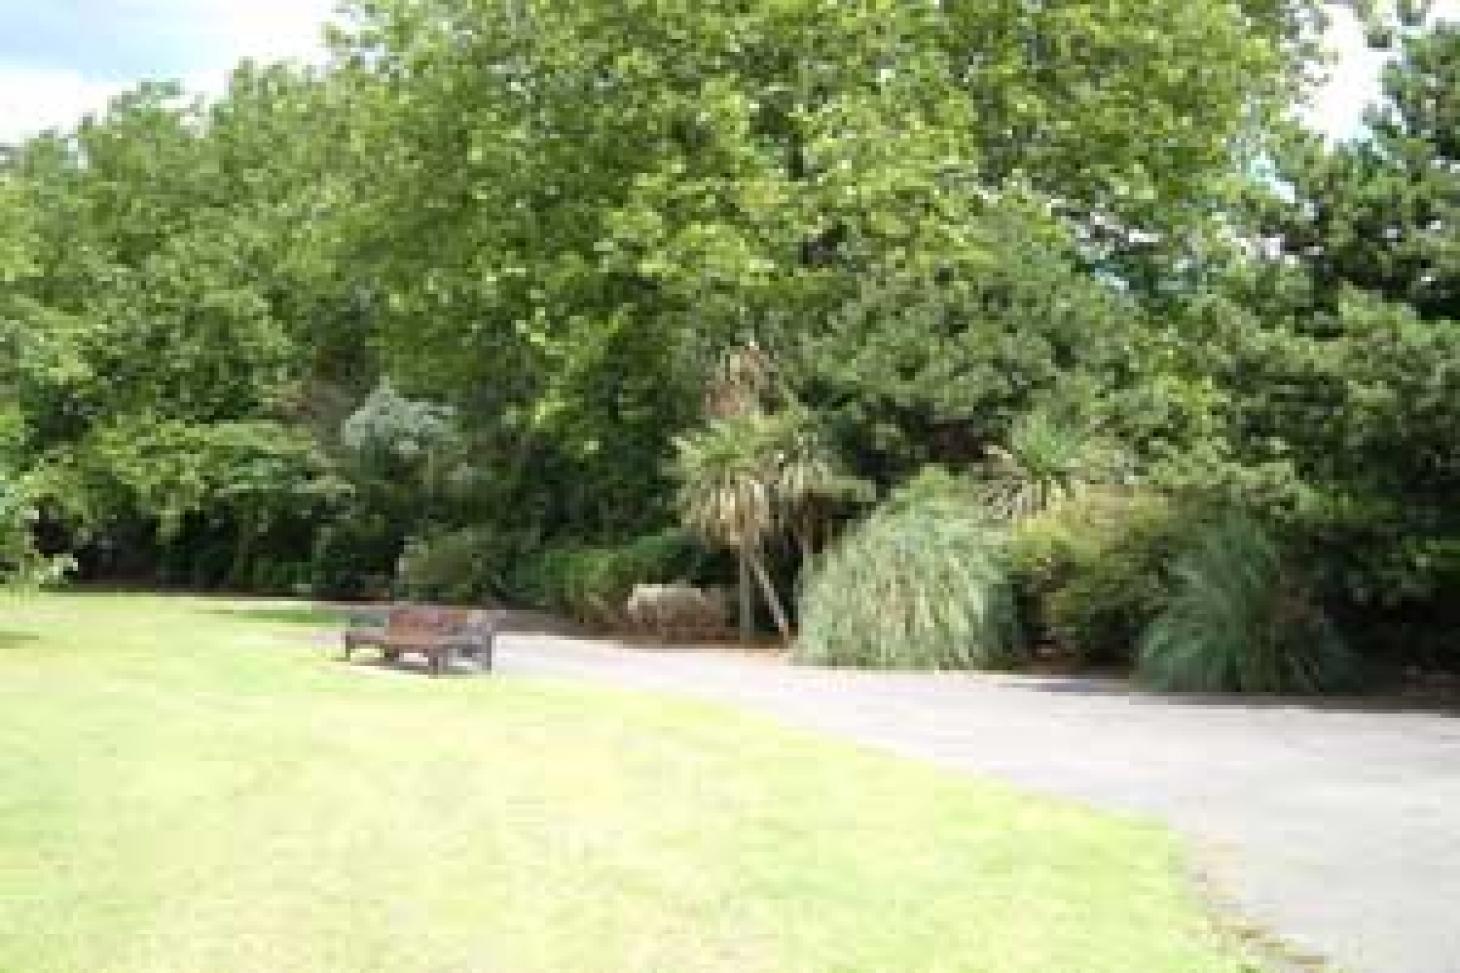 Childs Hill Park 11 a side | Grass football pitch